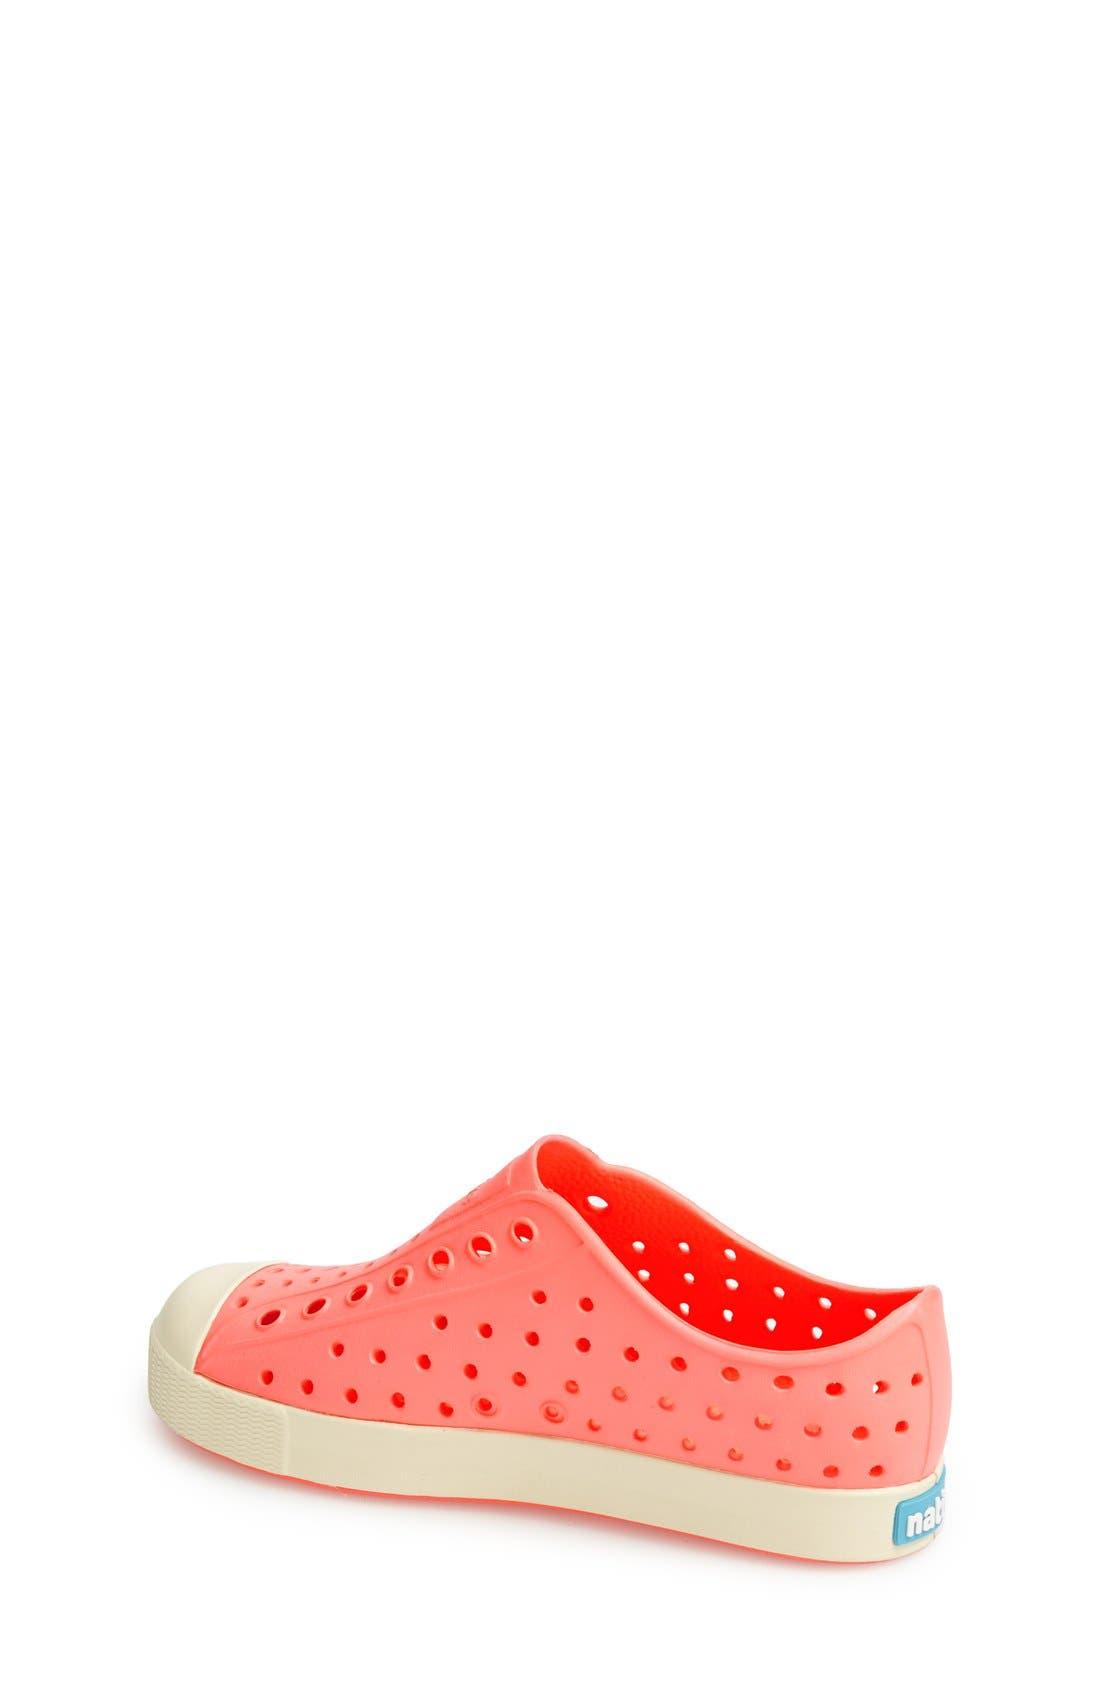 'Jefferson' Water Friendly Slip-On Sneaker,                             Alternate thumbnail 117, color,